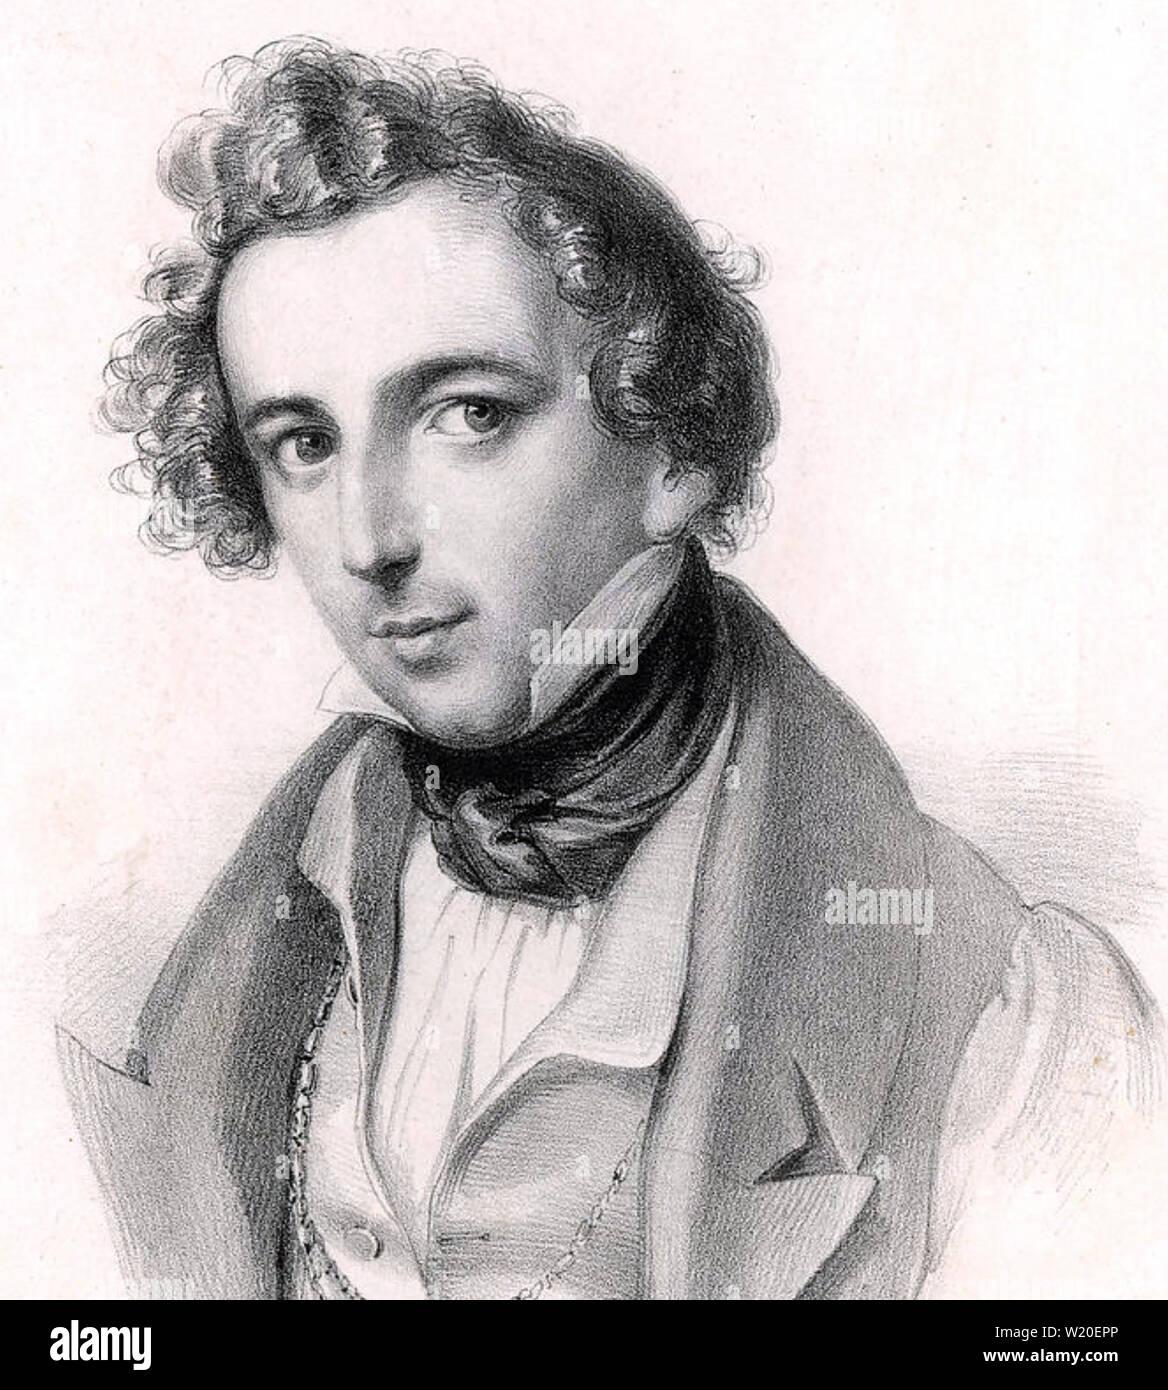 FELIX MENDELSSOHN (1809-1847) German composer about 1840 - Stock Image